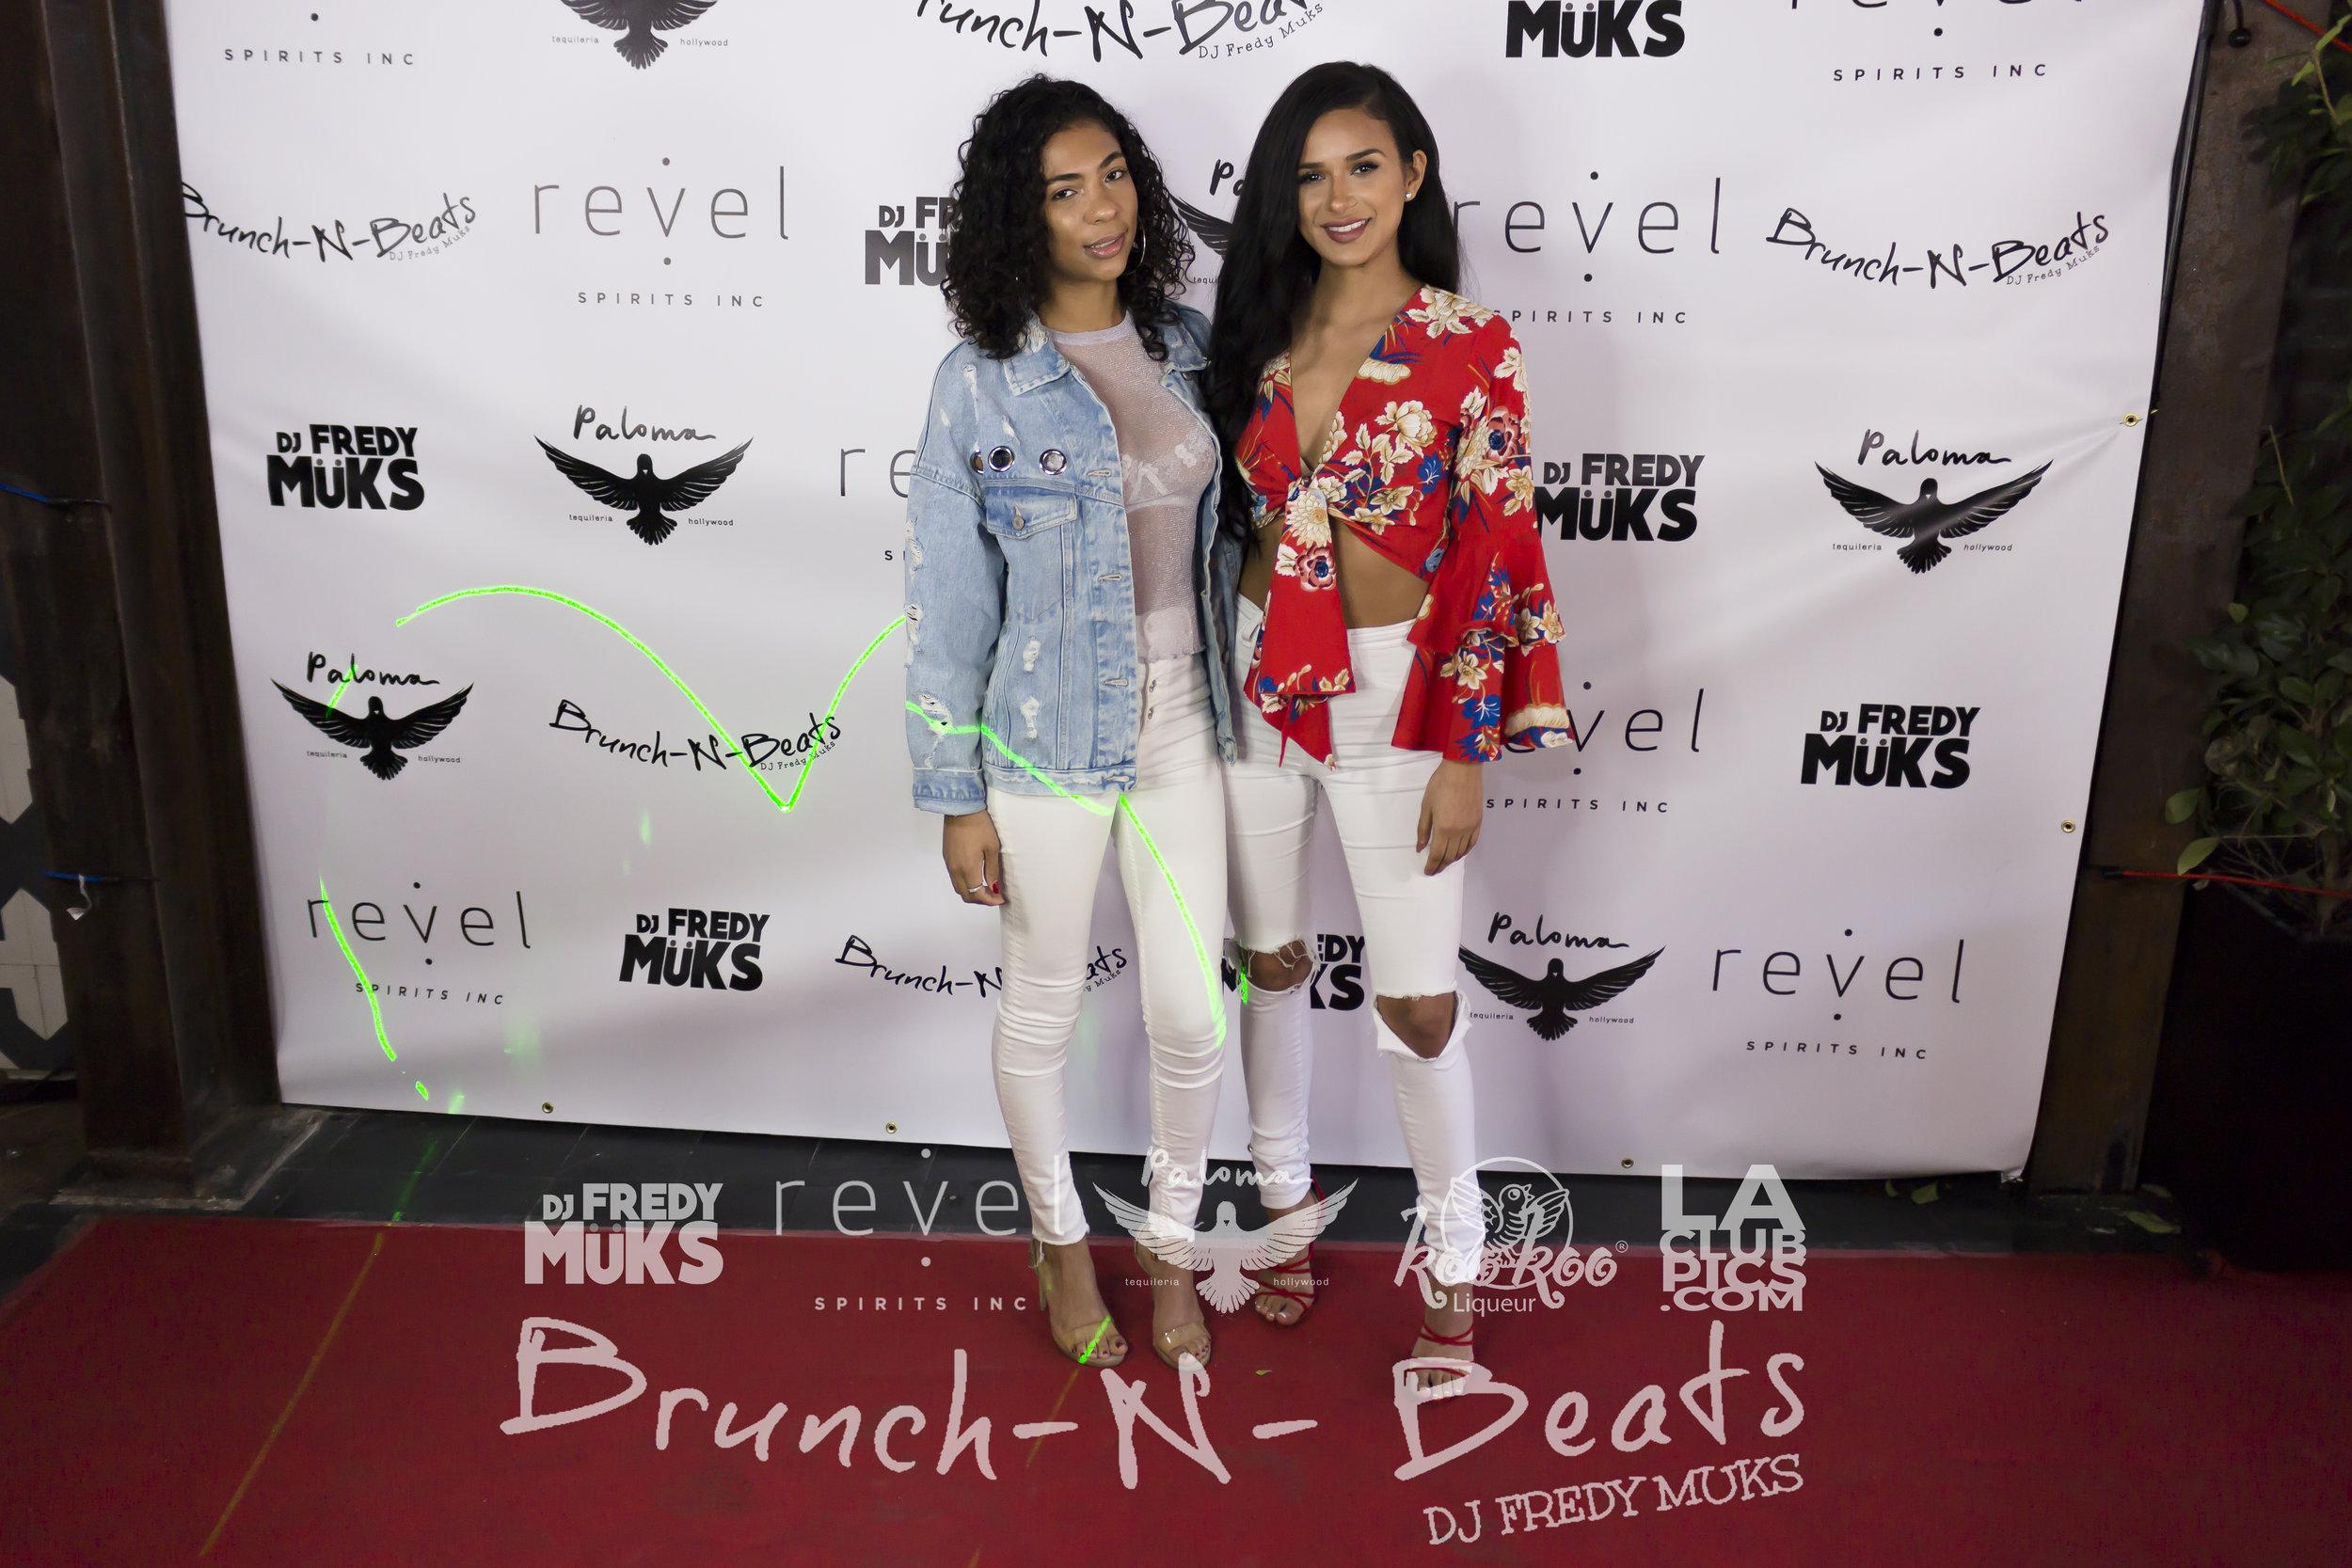 Brunch-N-Beats - Paloma Hollywood - 02-25-18_24.jpg